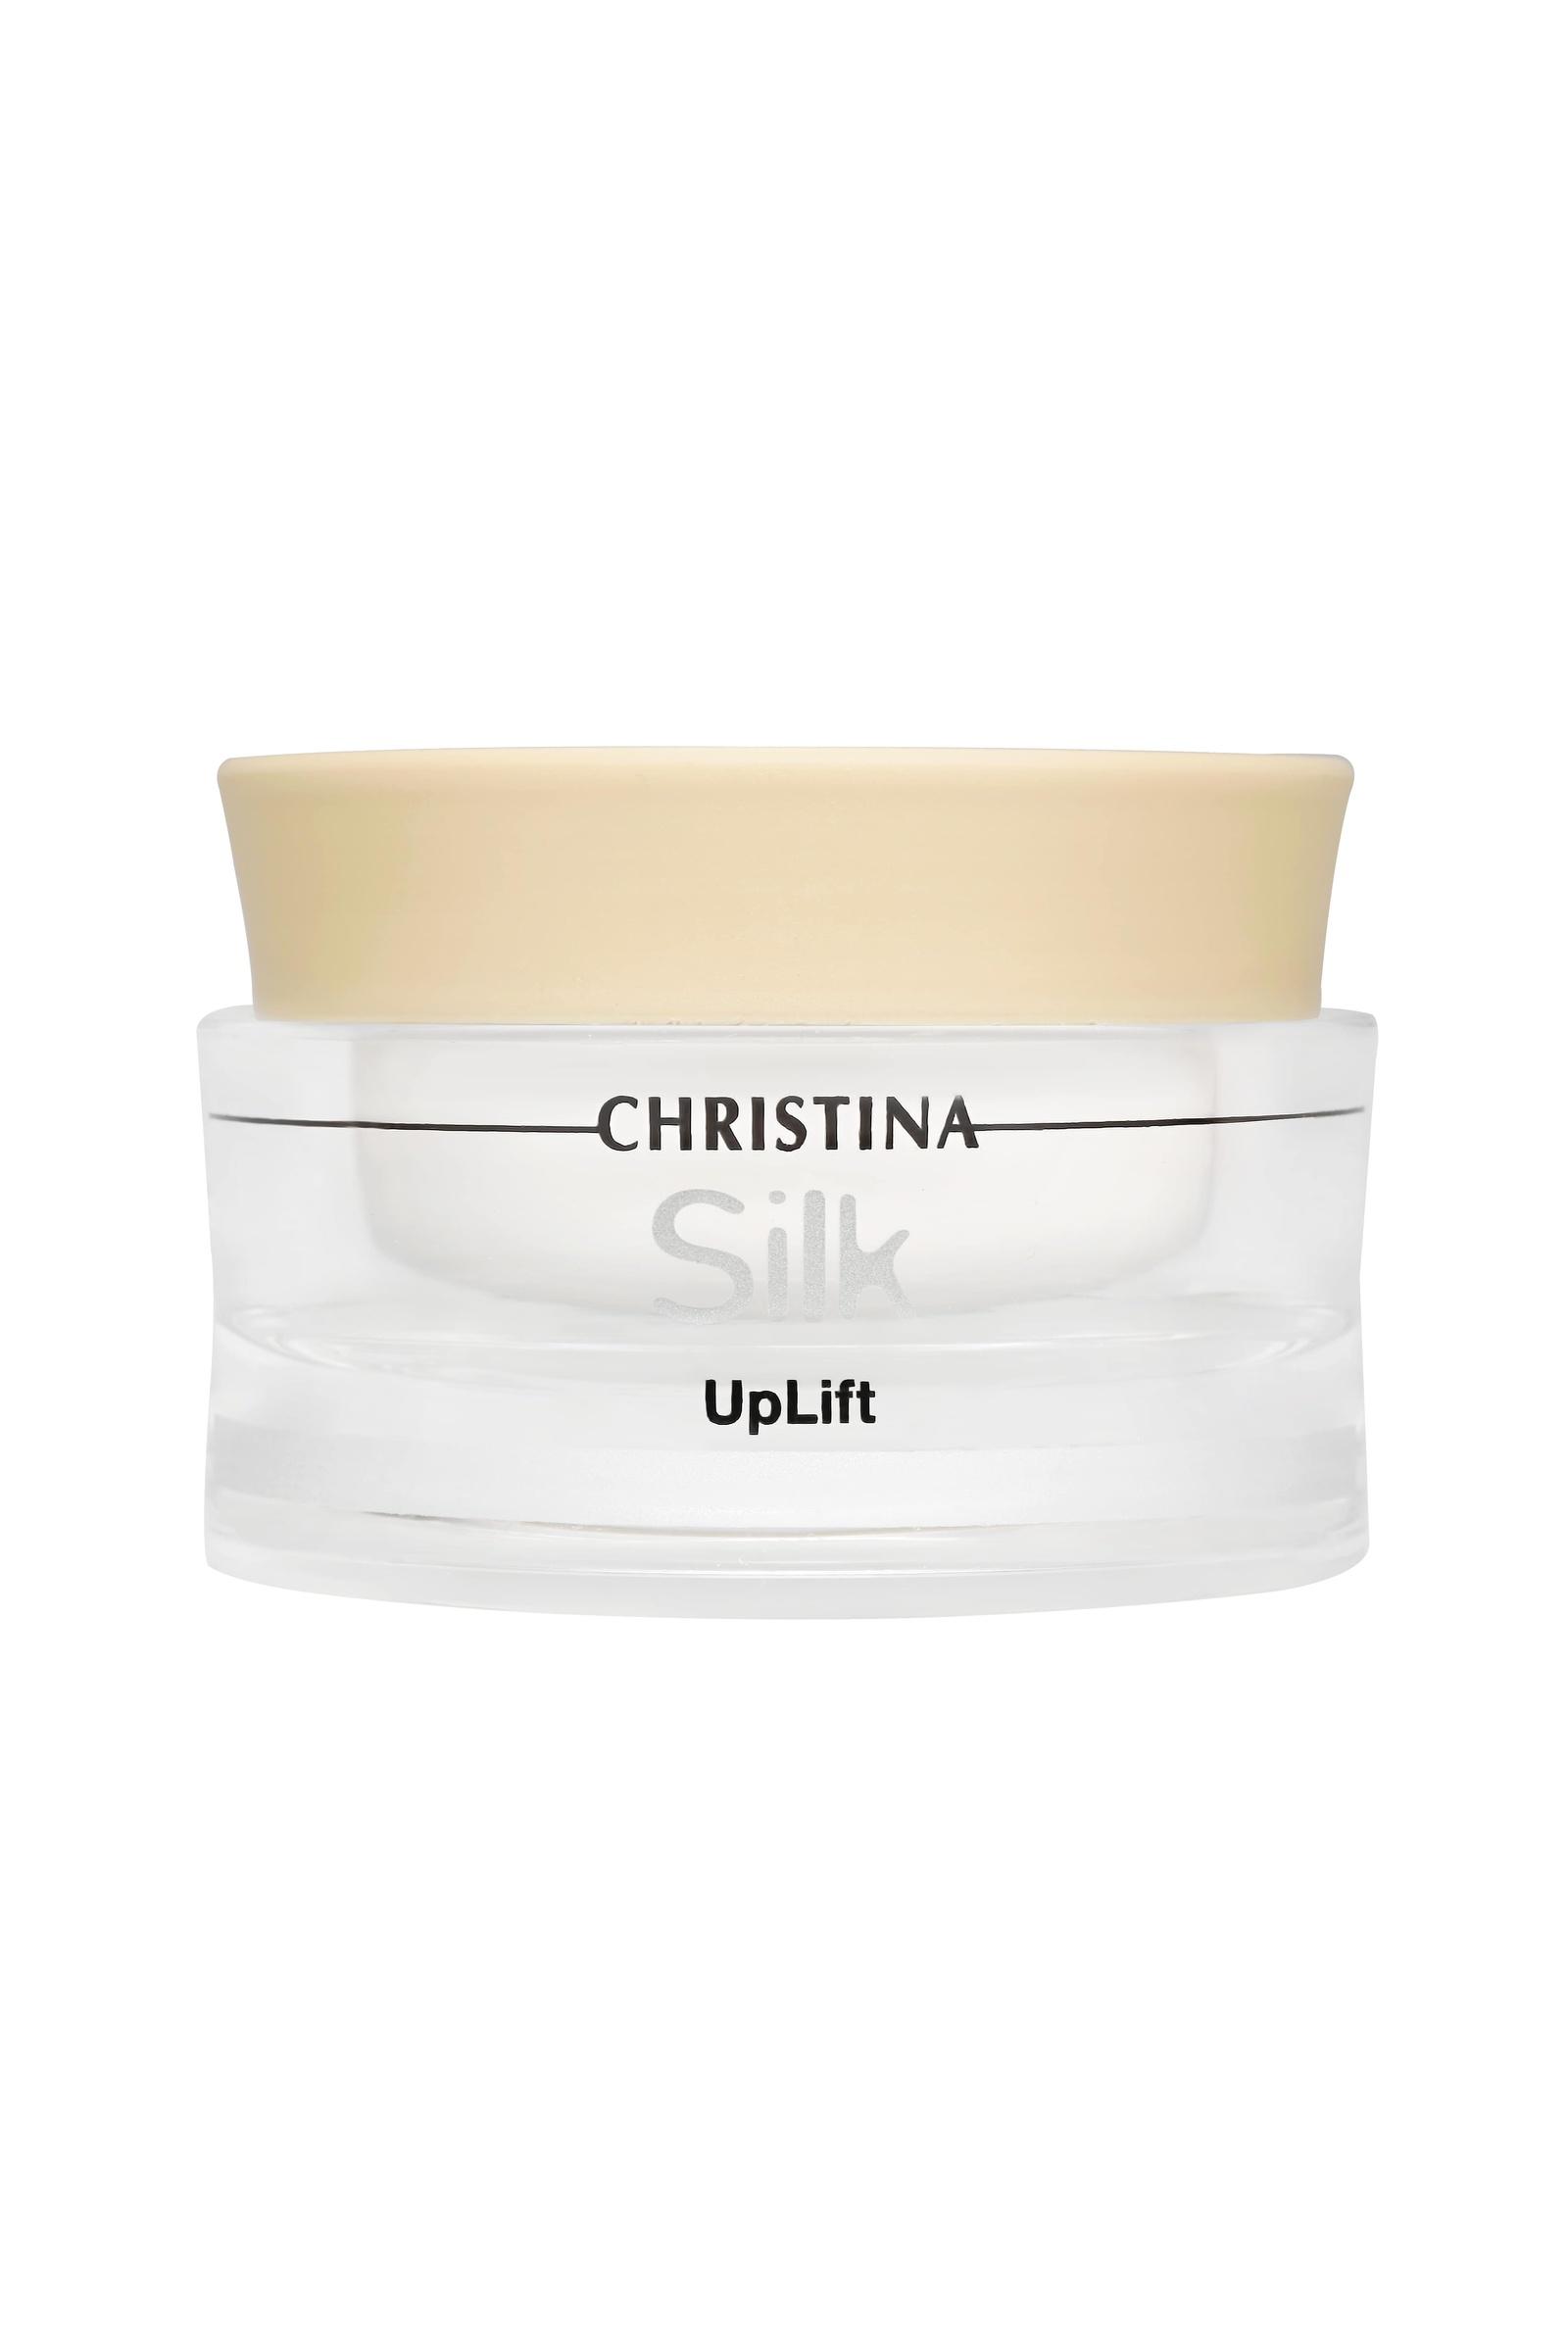 Крем для ухода за кожей CHRISTINA Подтягивающий Silk UpLift Cream крем для ухода за кожей christina очищающий silk cleanup